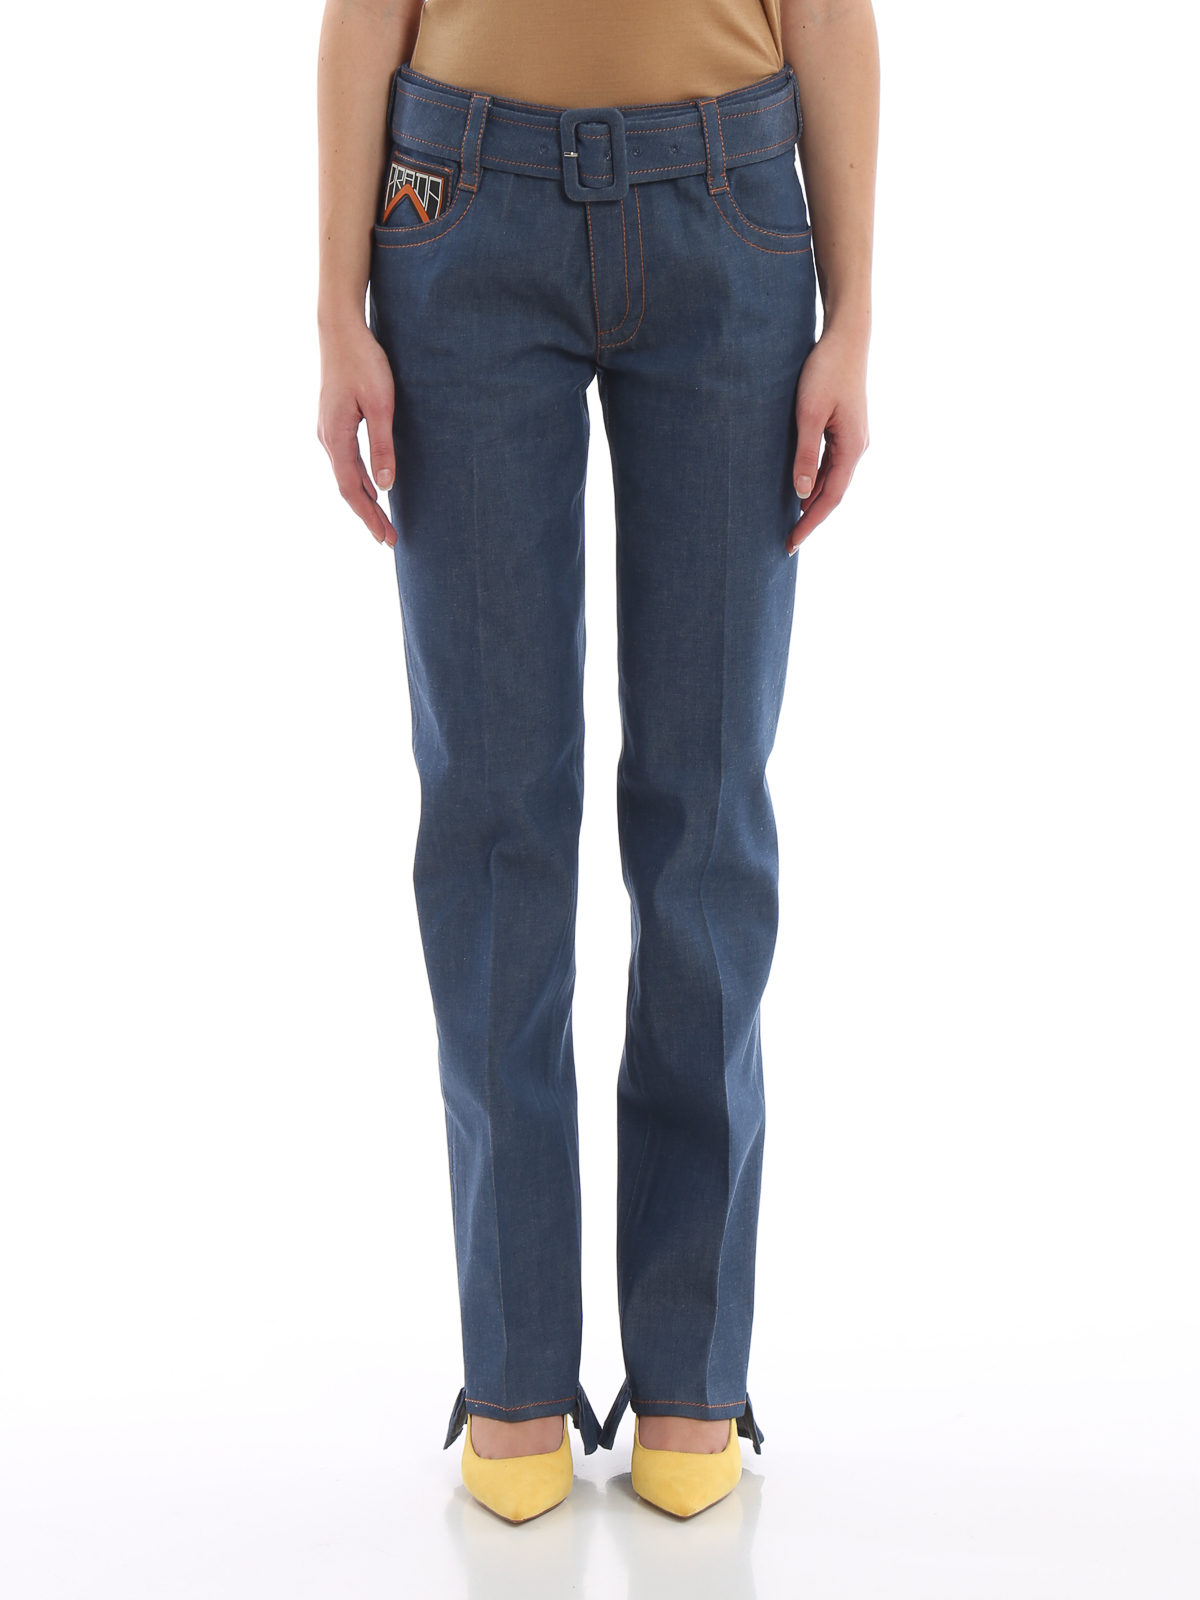 43bce132 Prada - Light compact denim frilled jeans with belt - straight leg ...